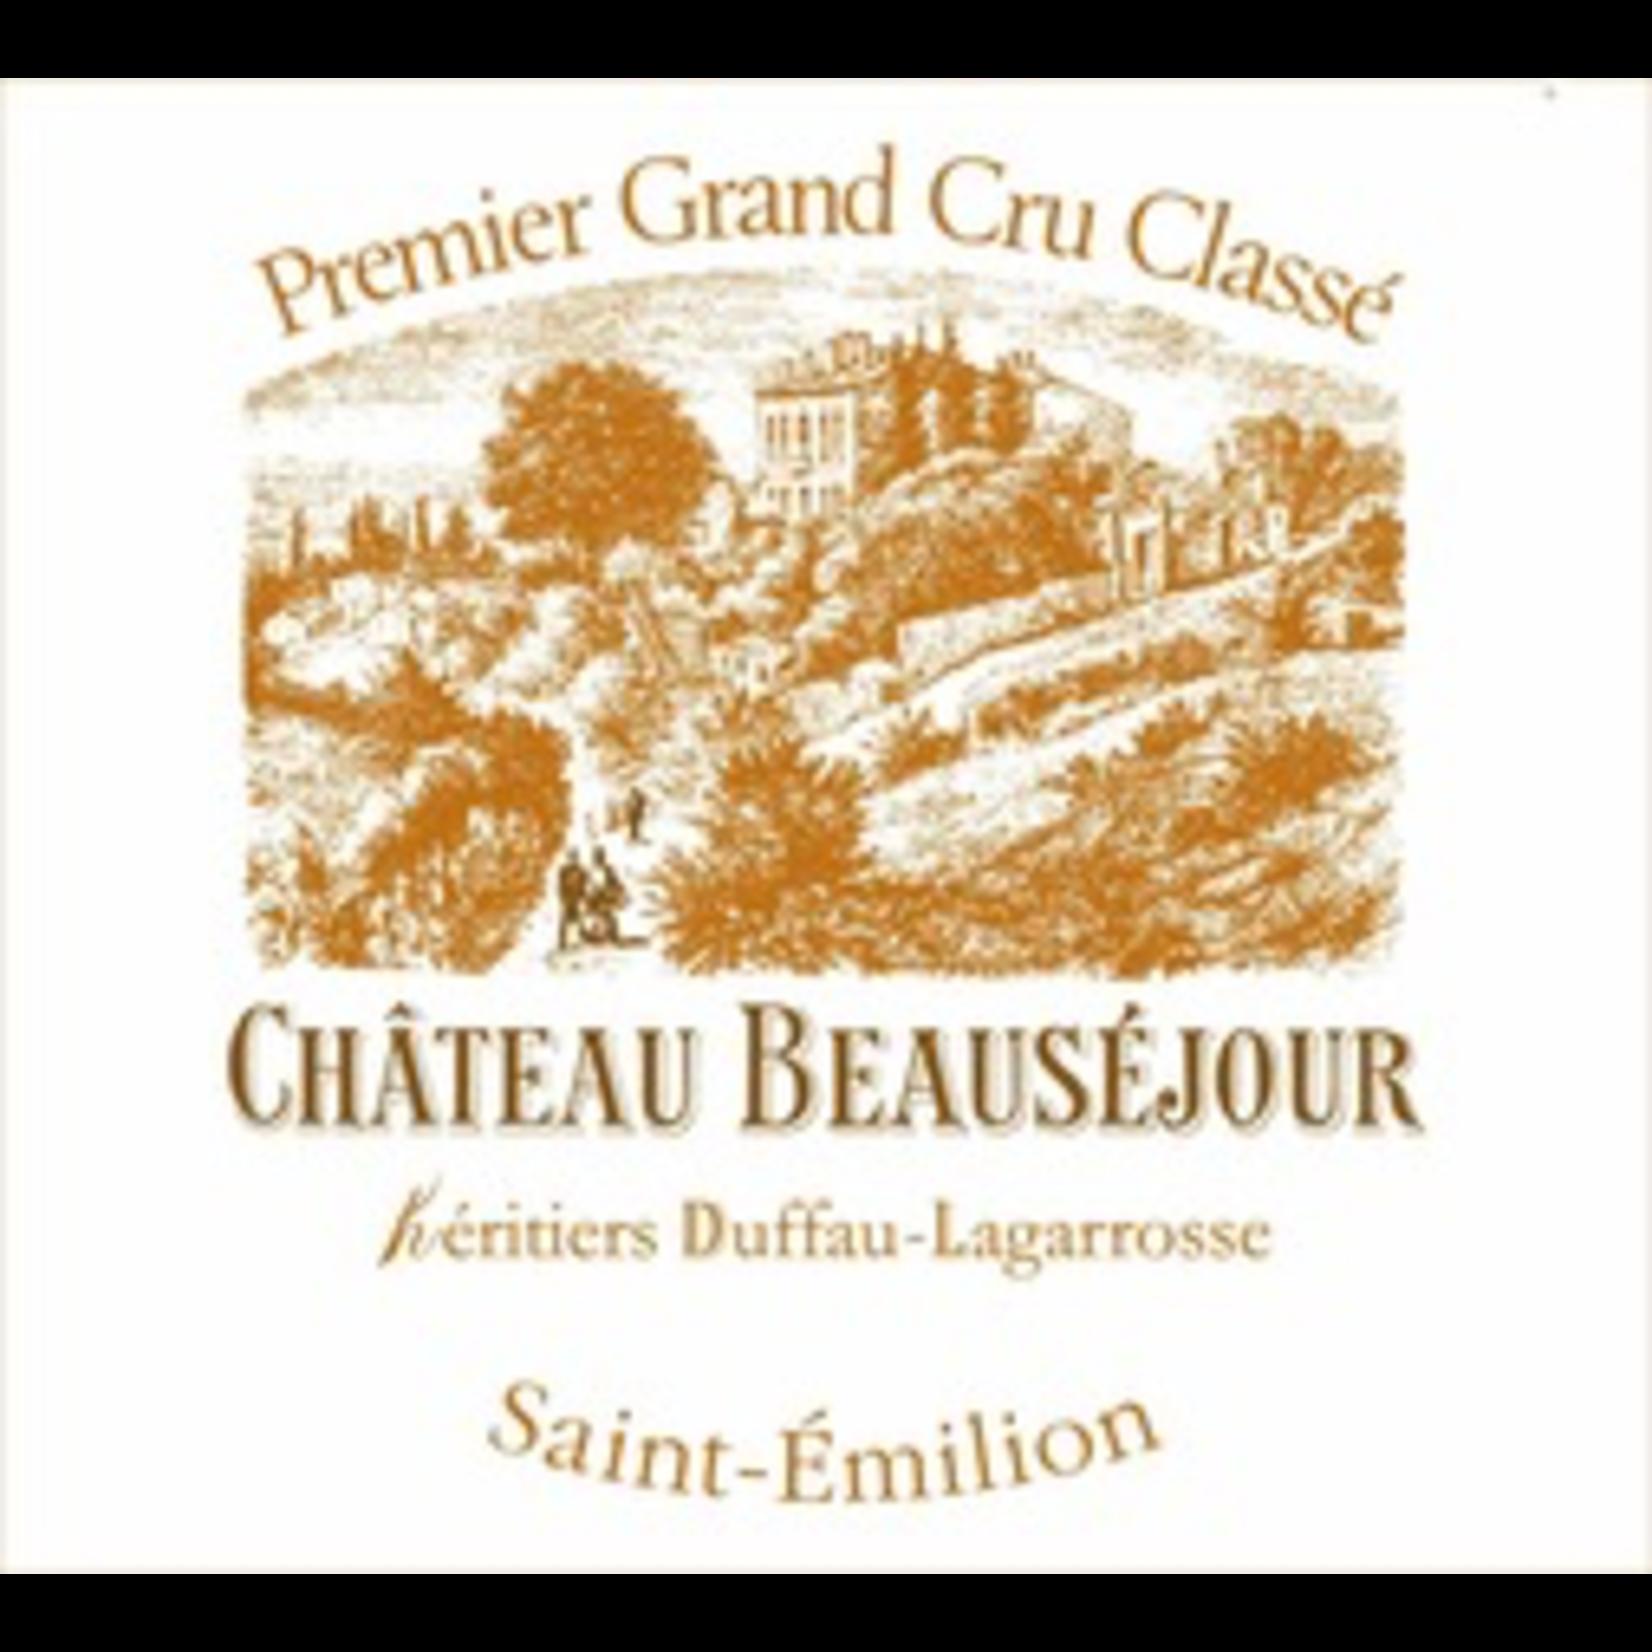 Wine Chateau Beausejour Duffau 2009